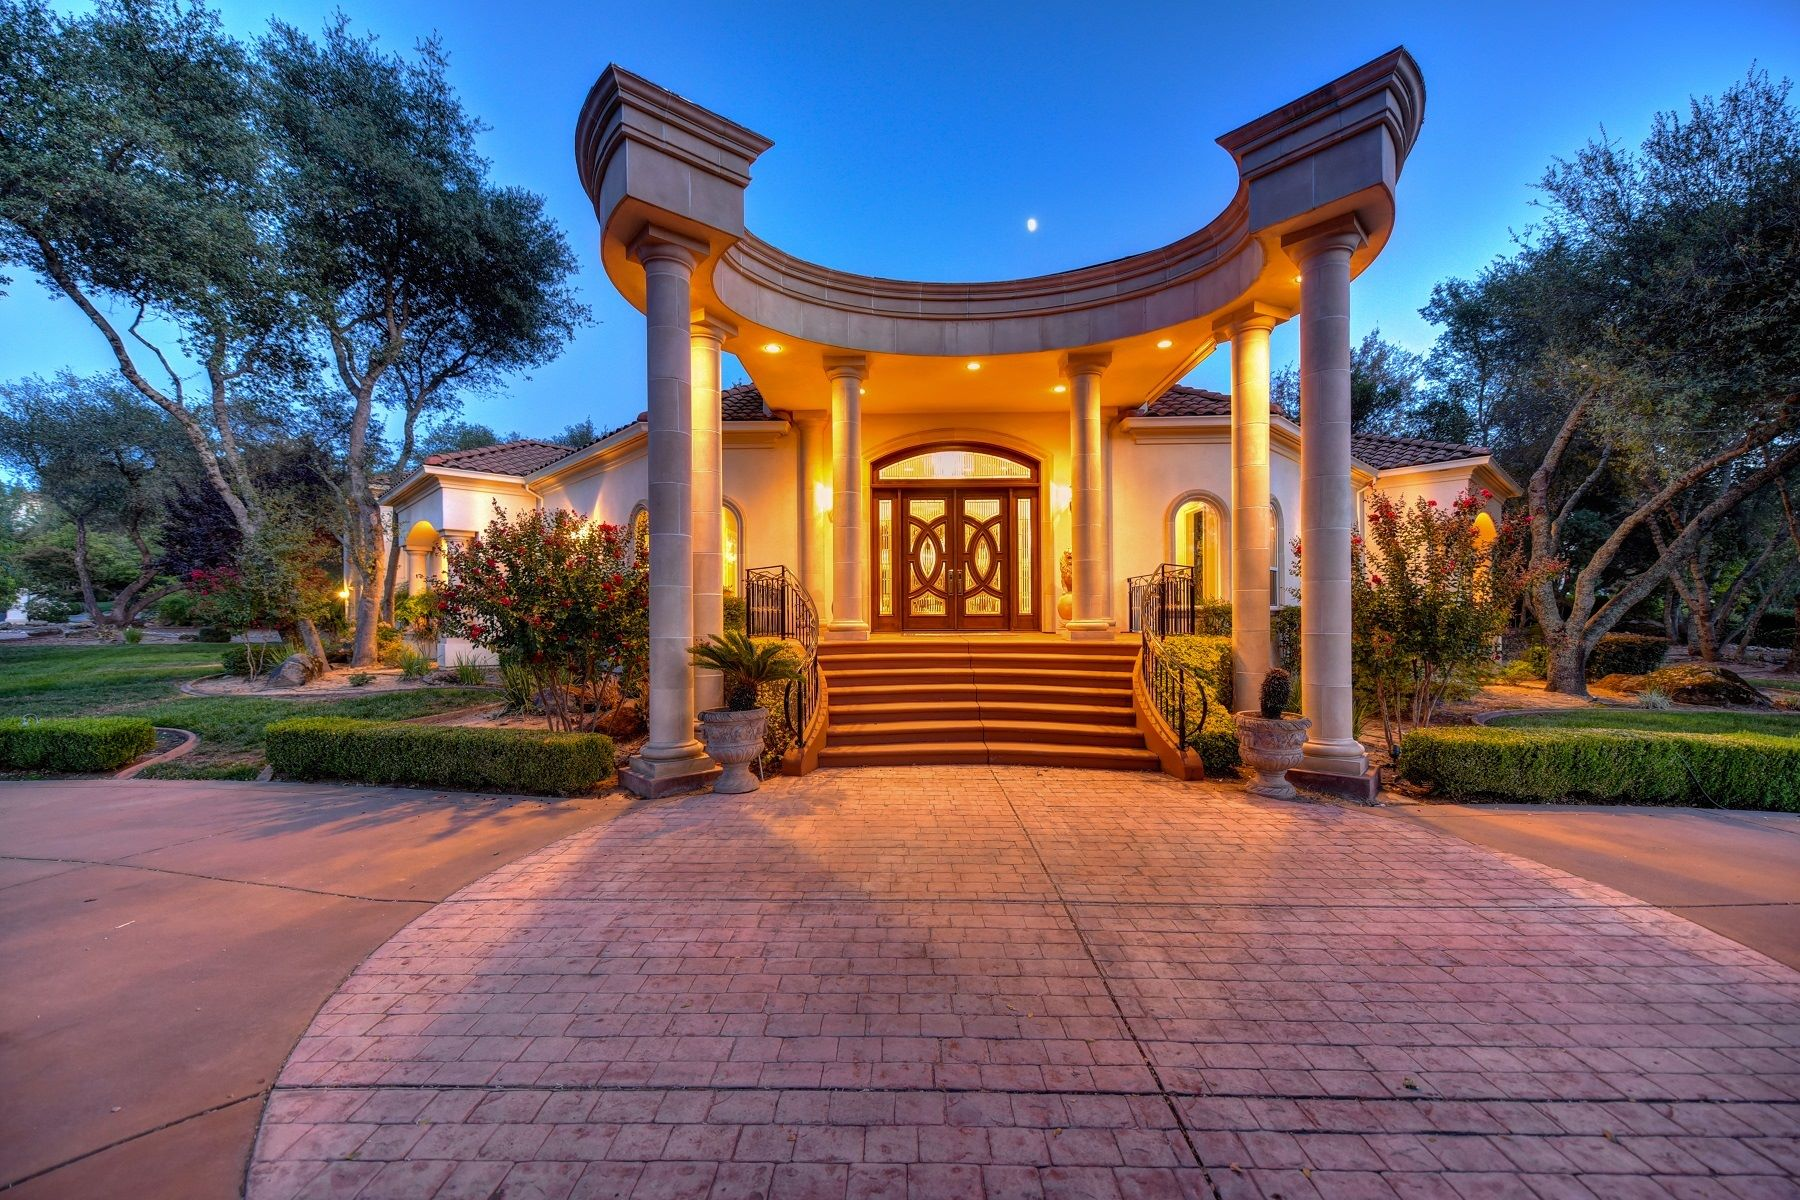 Single Family Home for Active at 8990 Camino Del Avion Granite Bay, California 95746 United States